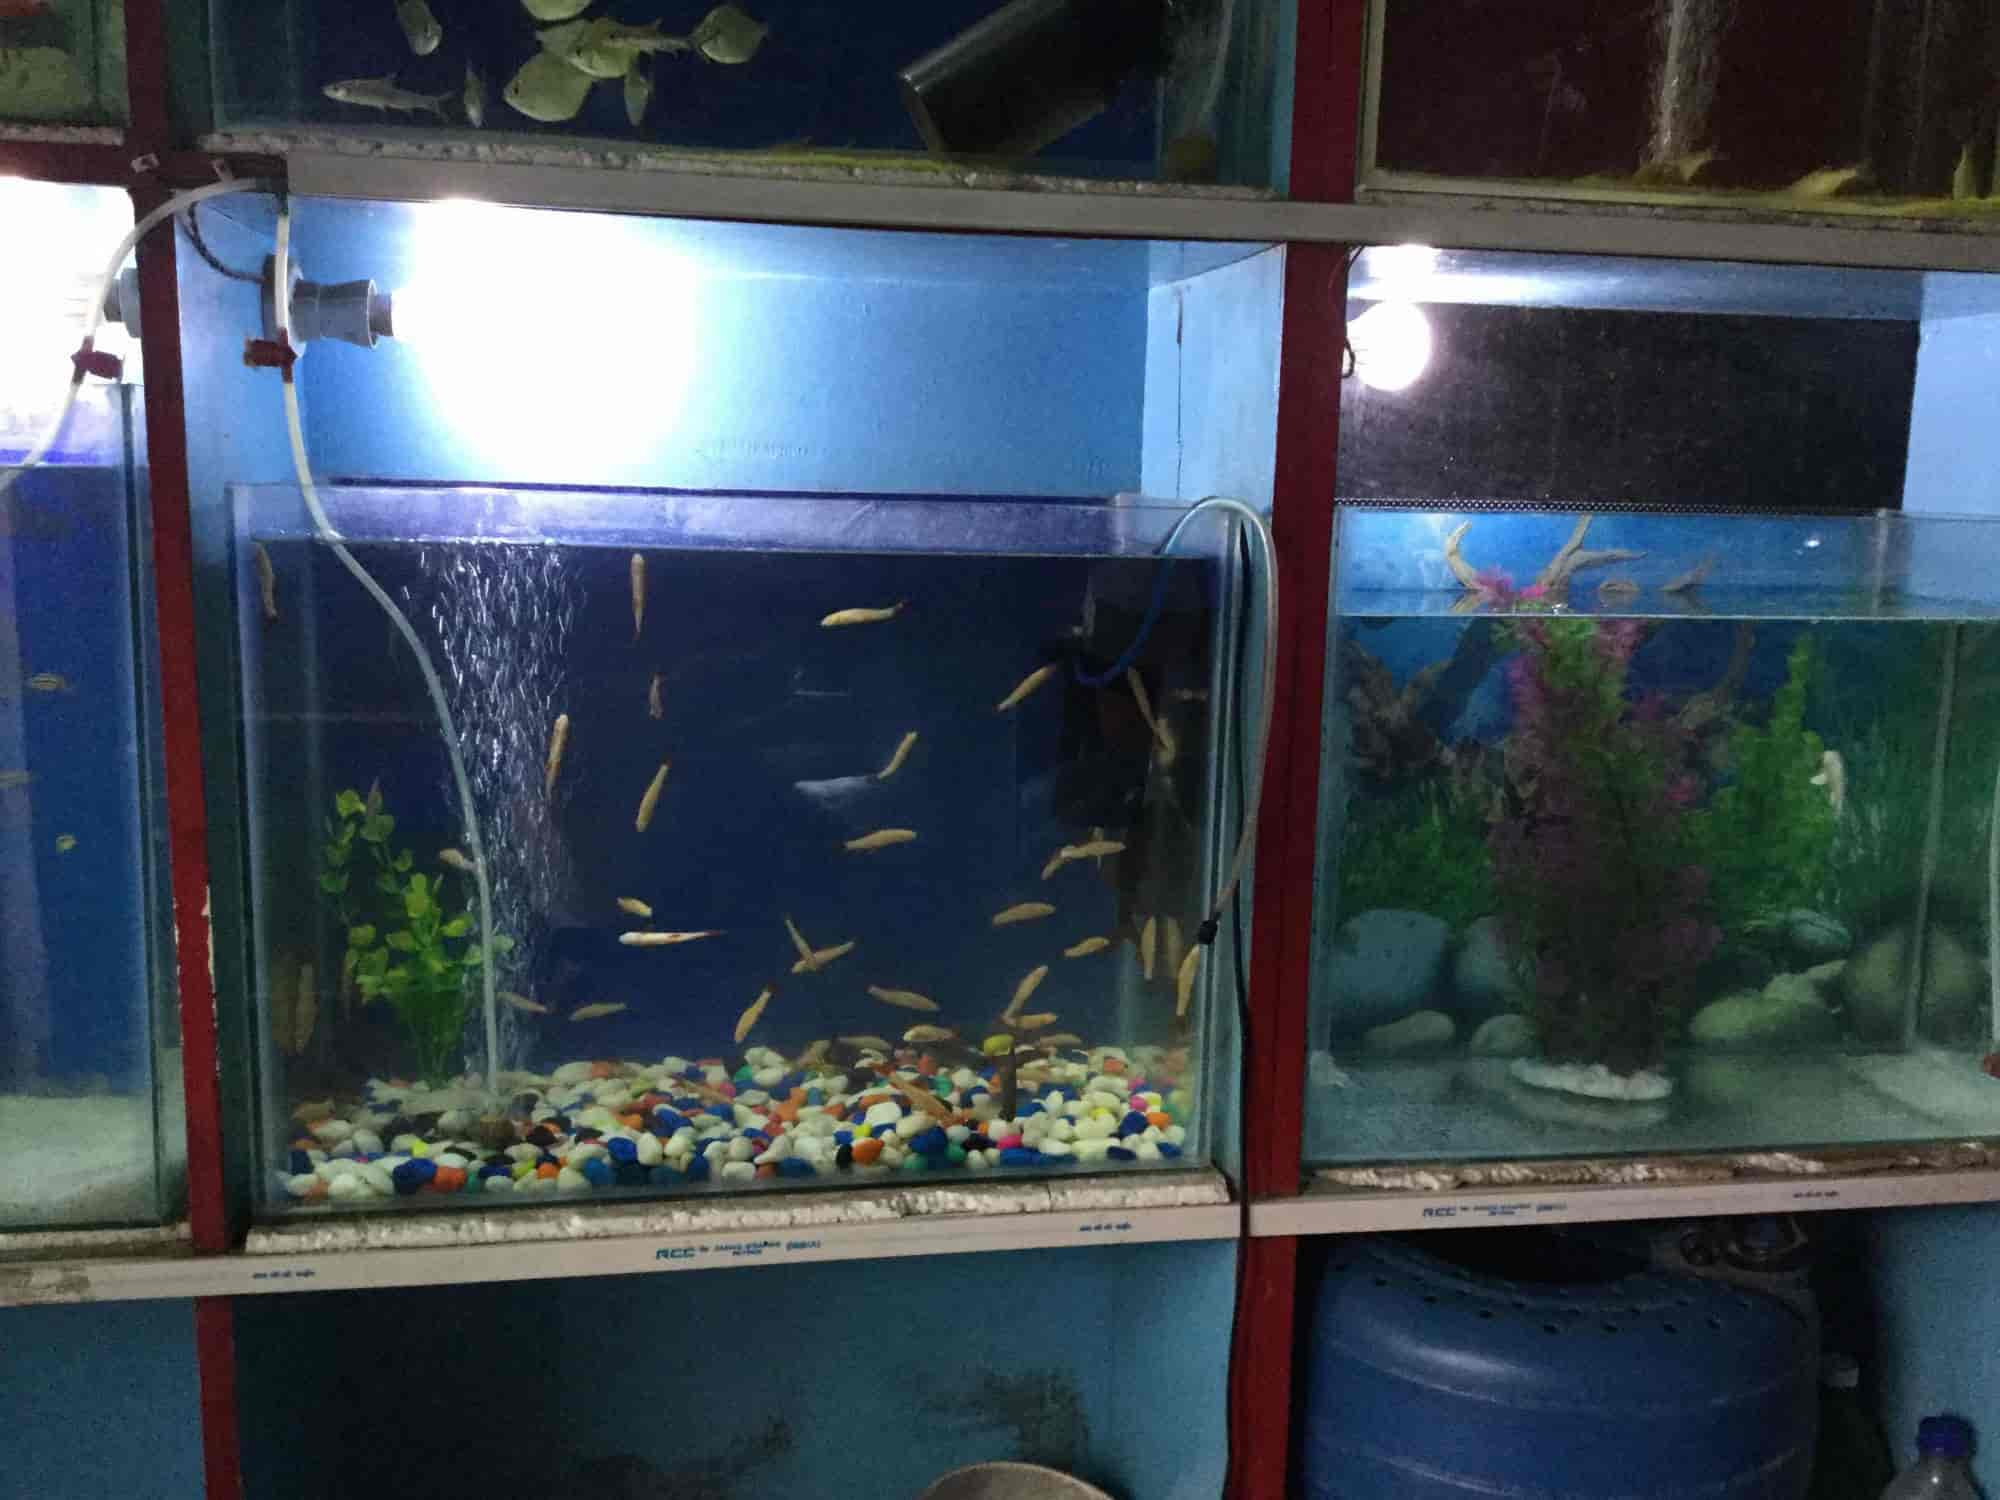 Chandra Aquarium Indira Nagar Lucknow Aquariums in Lucknow Justdial